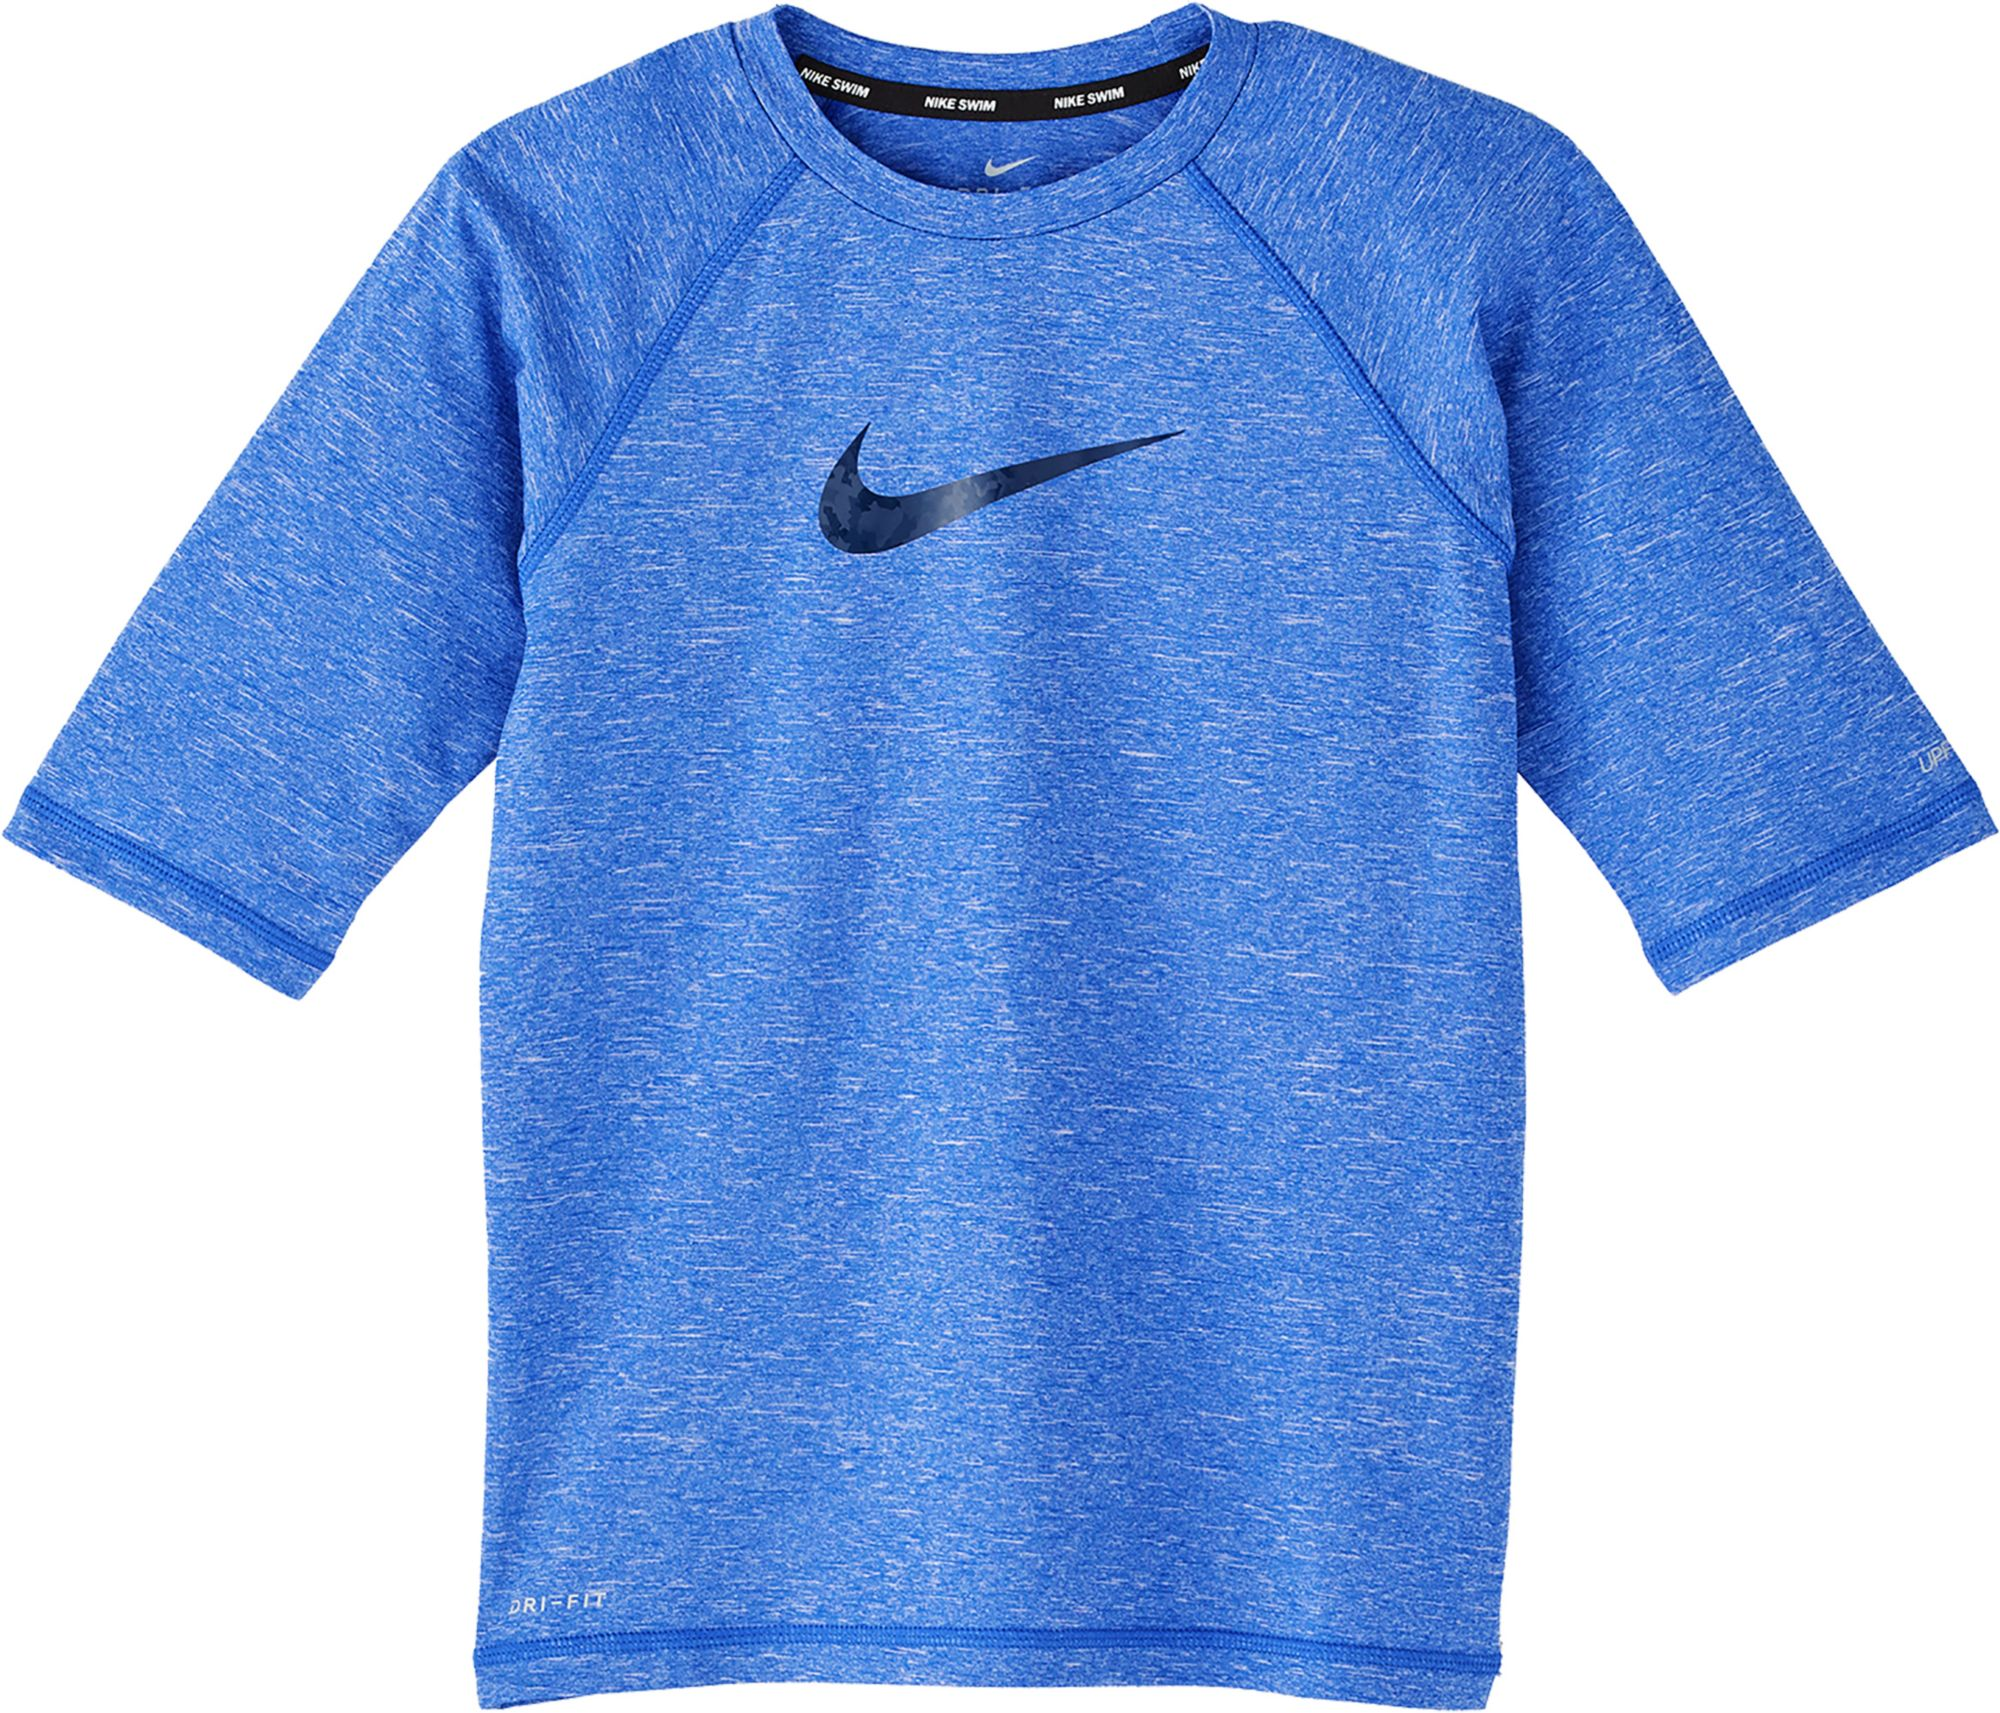 1da969c02 Nike Boys' Heather Camo Swoosh Half Sleeve Hydro Rash Guard | DICK'S ...